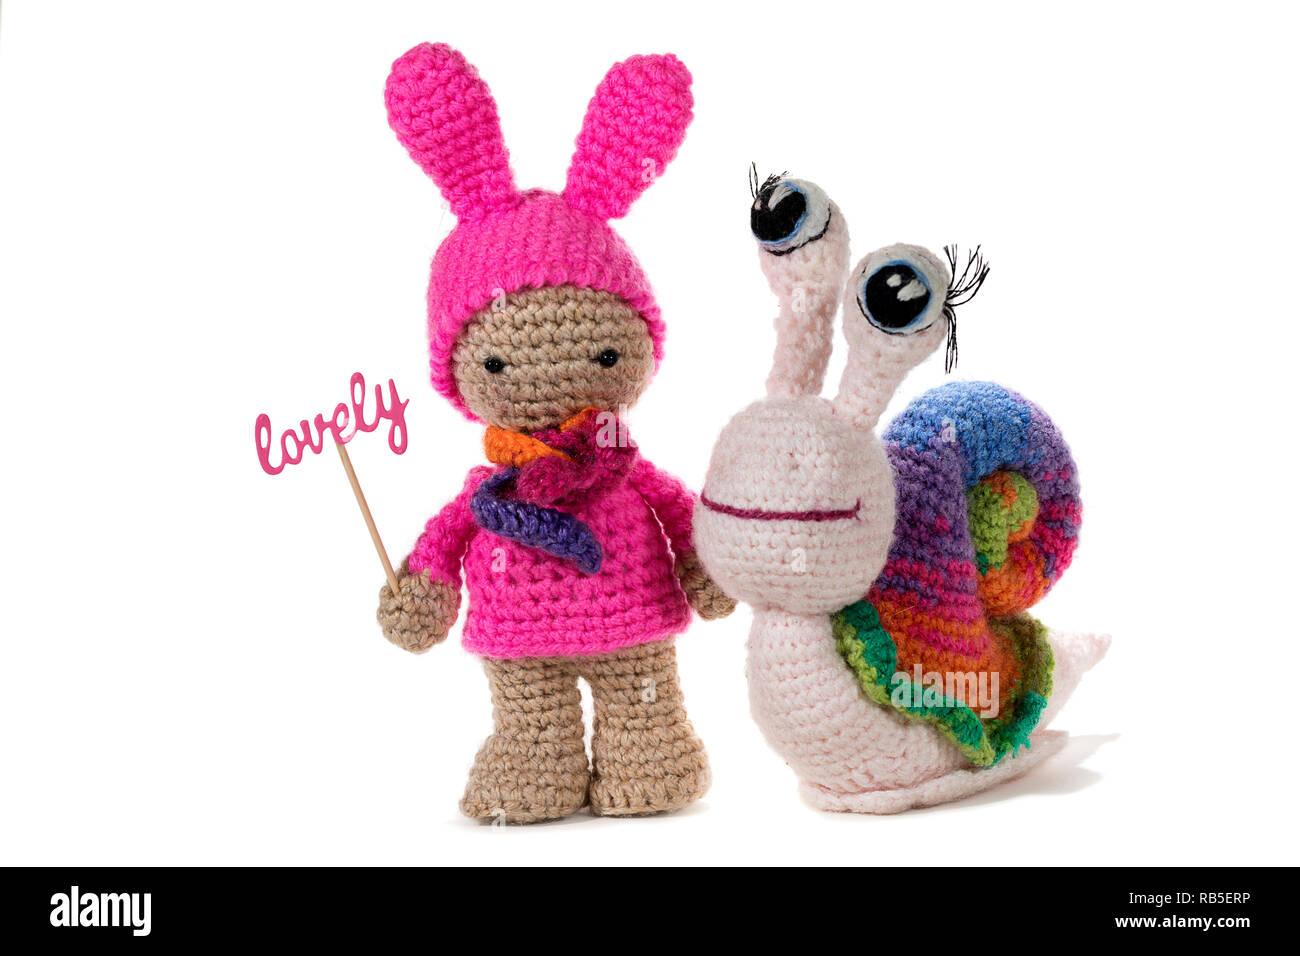 Baby Knitting Patterns Step-by-Step Crochet Toy #amigurumi ...   956x1300